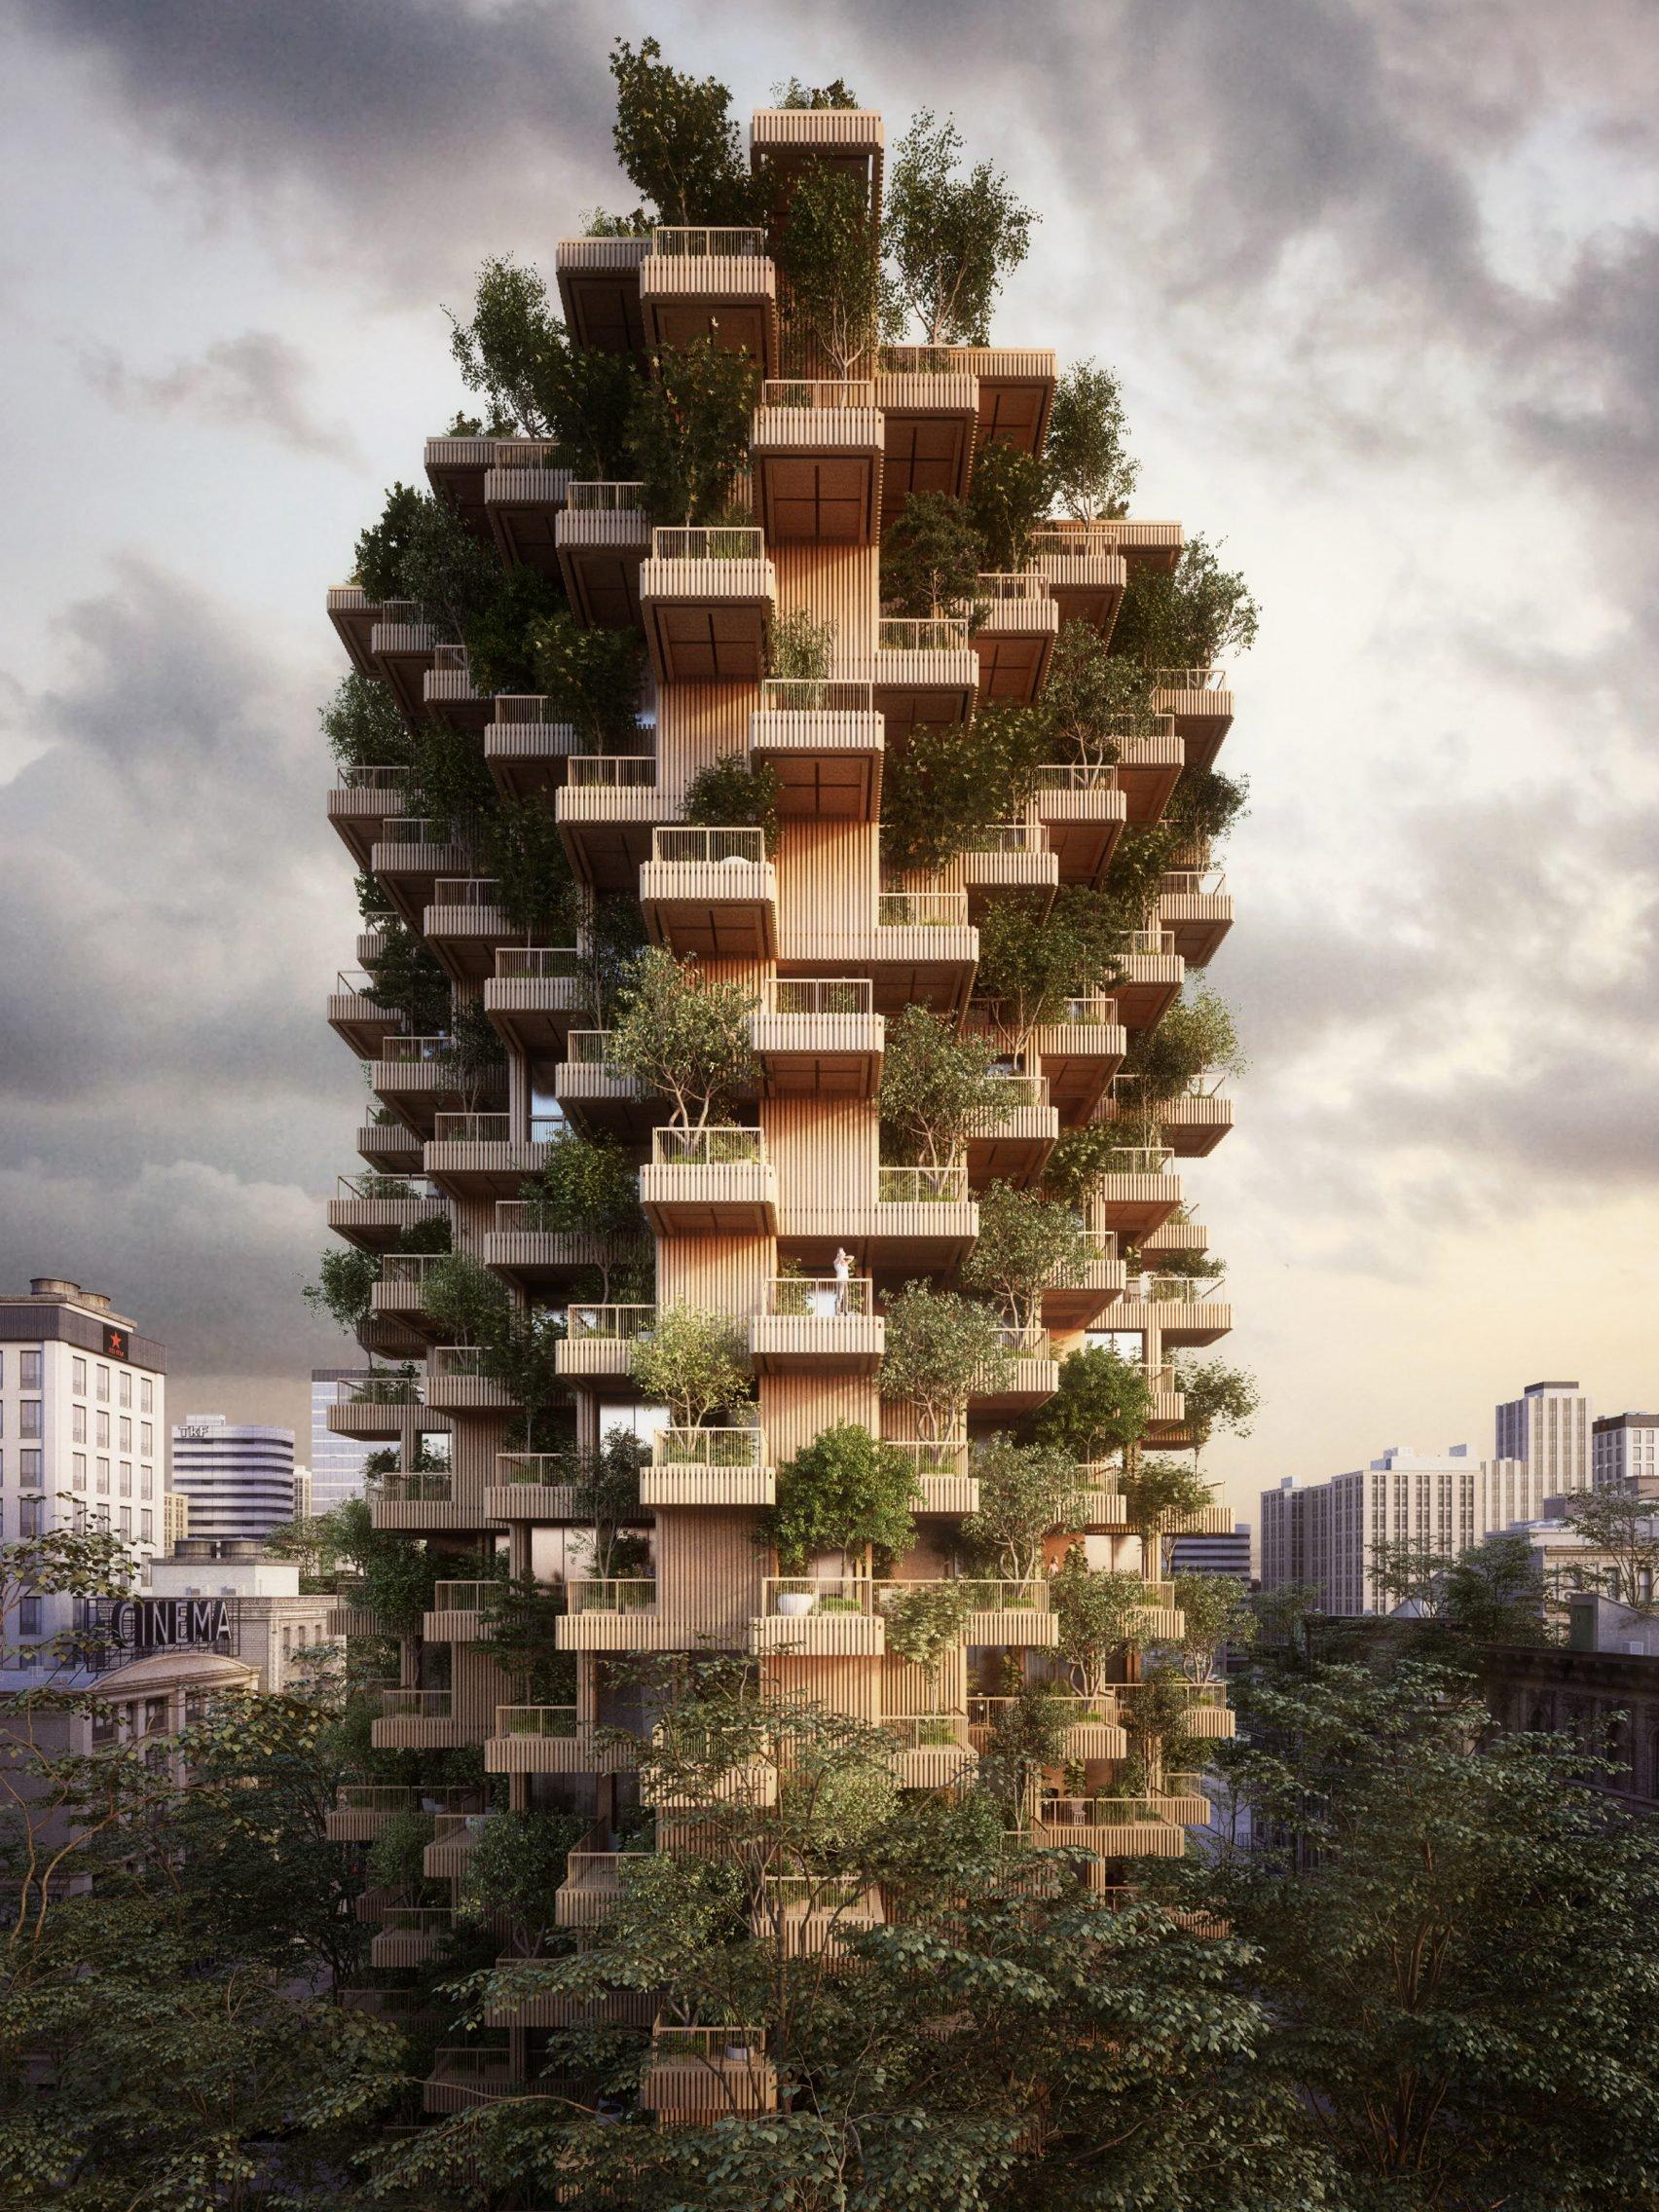 Toronto Tree Tower project